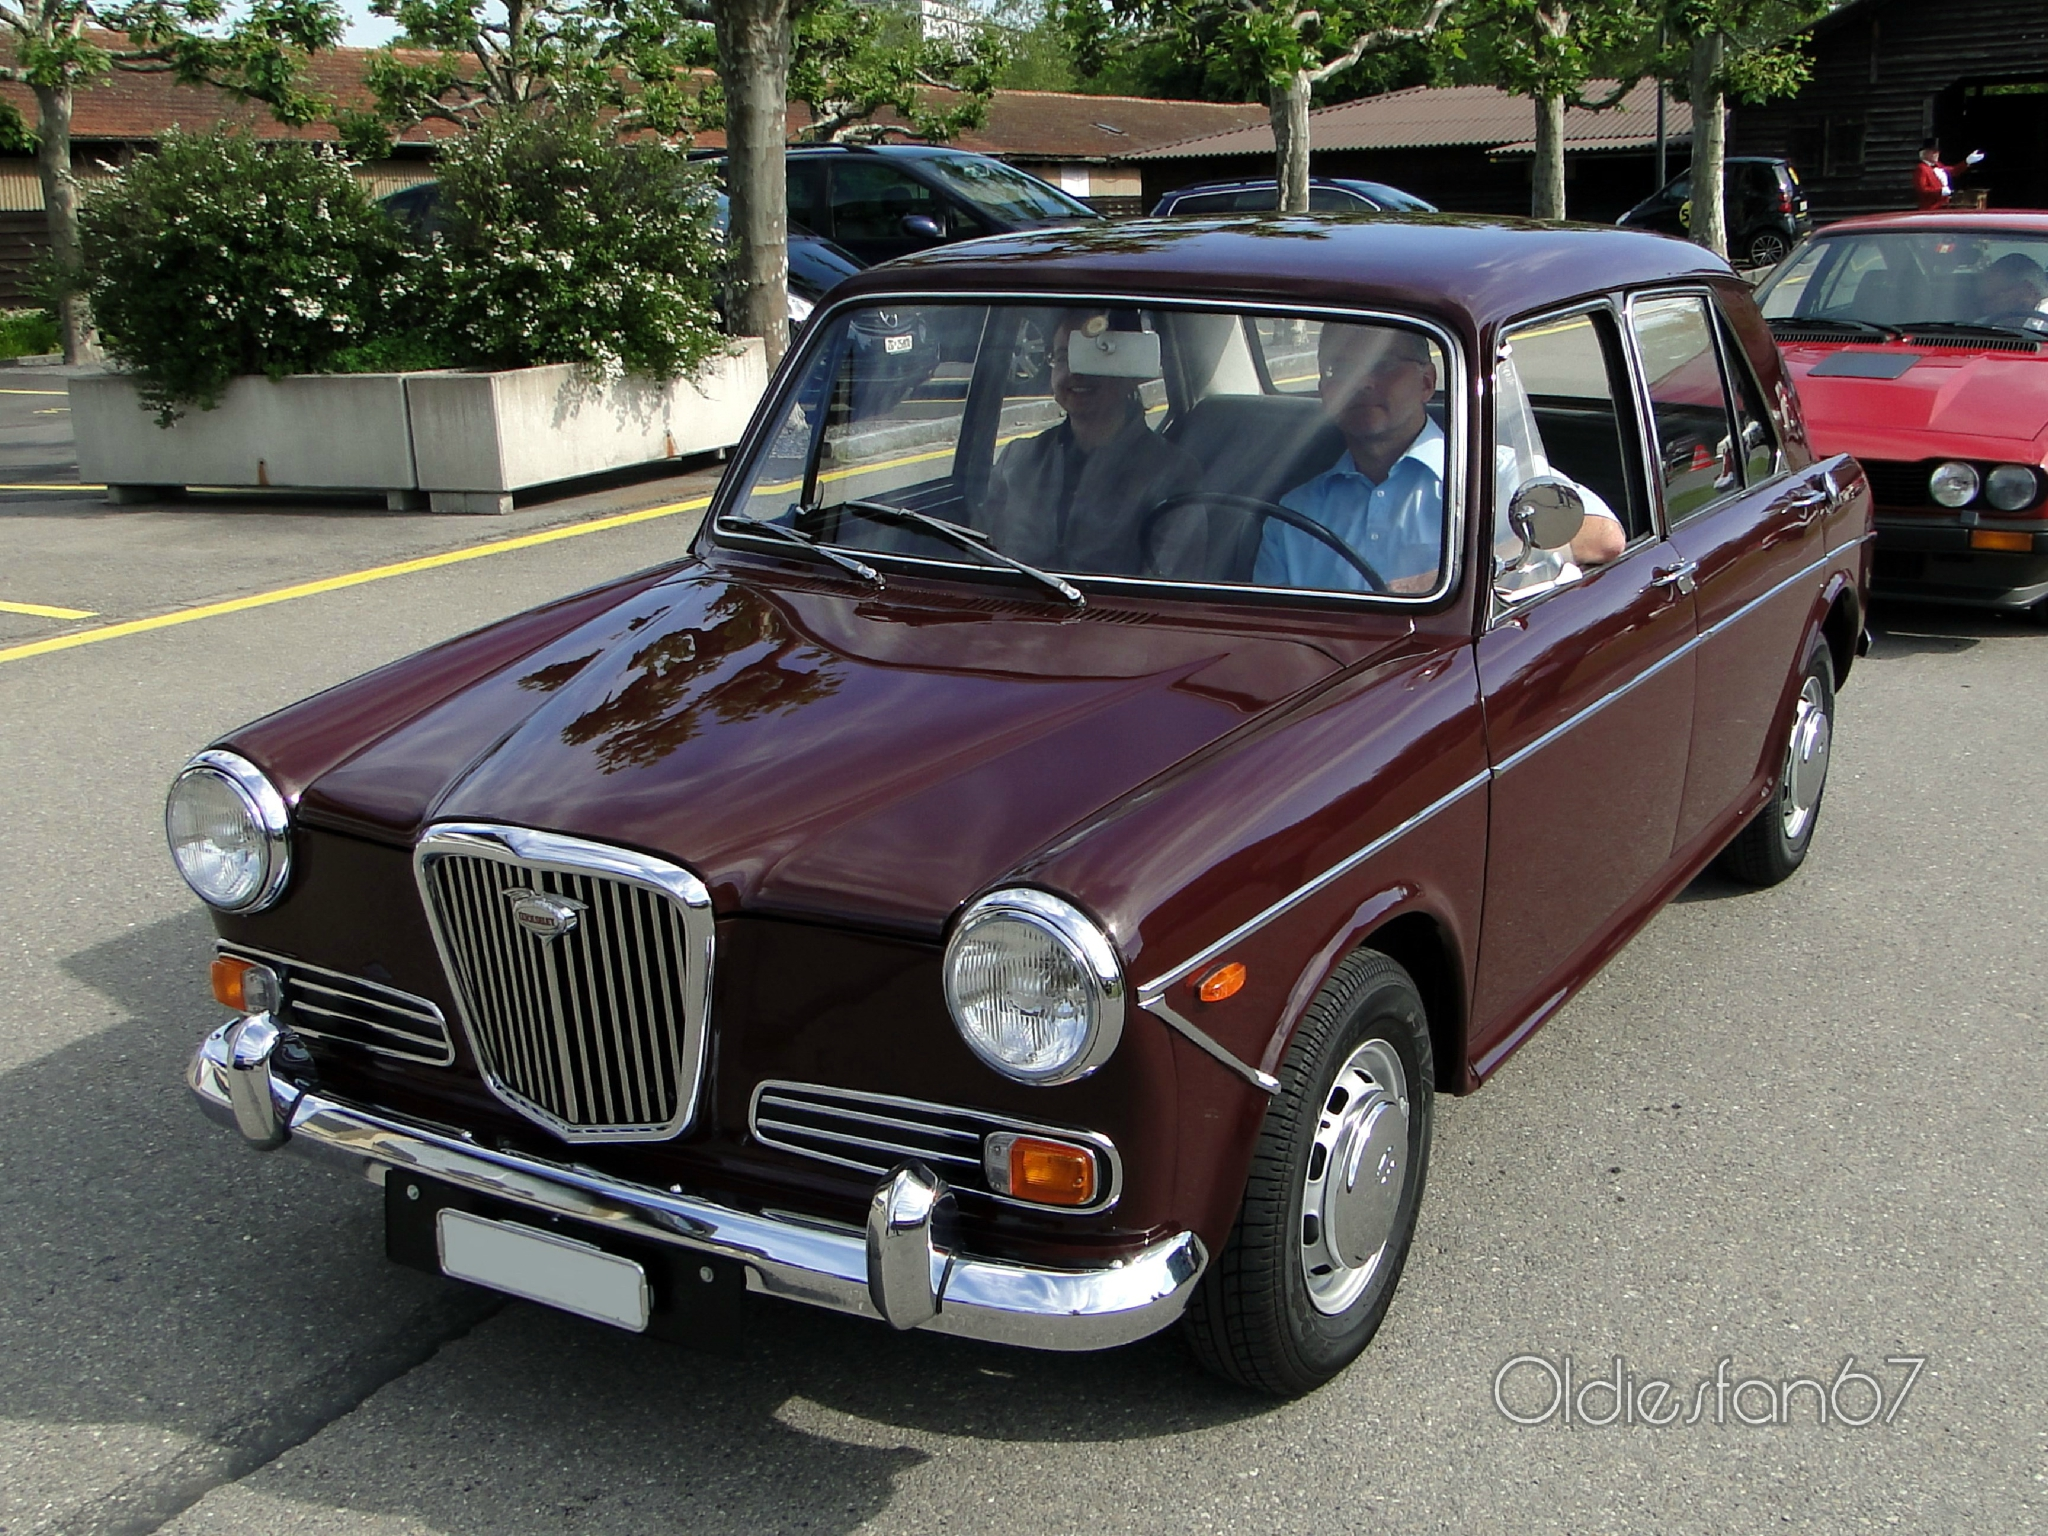 wolseley-1300-mk2-1968-1973-a